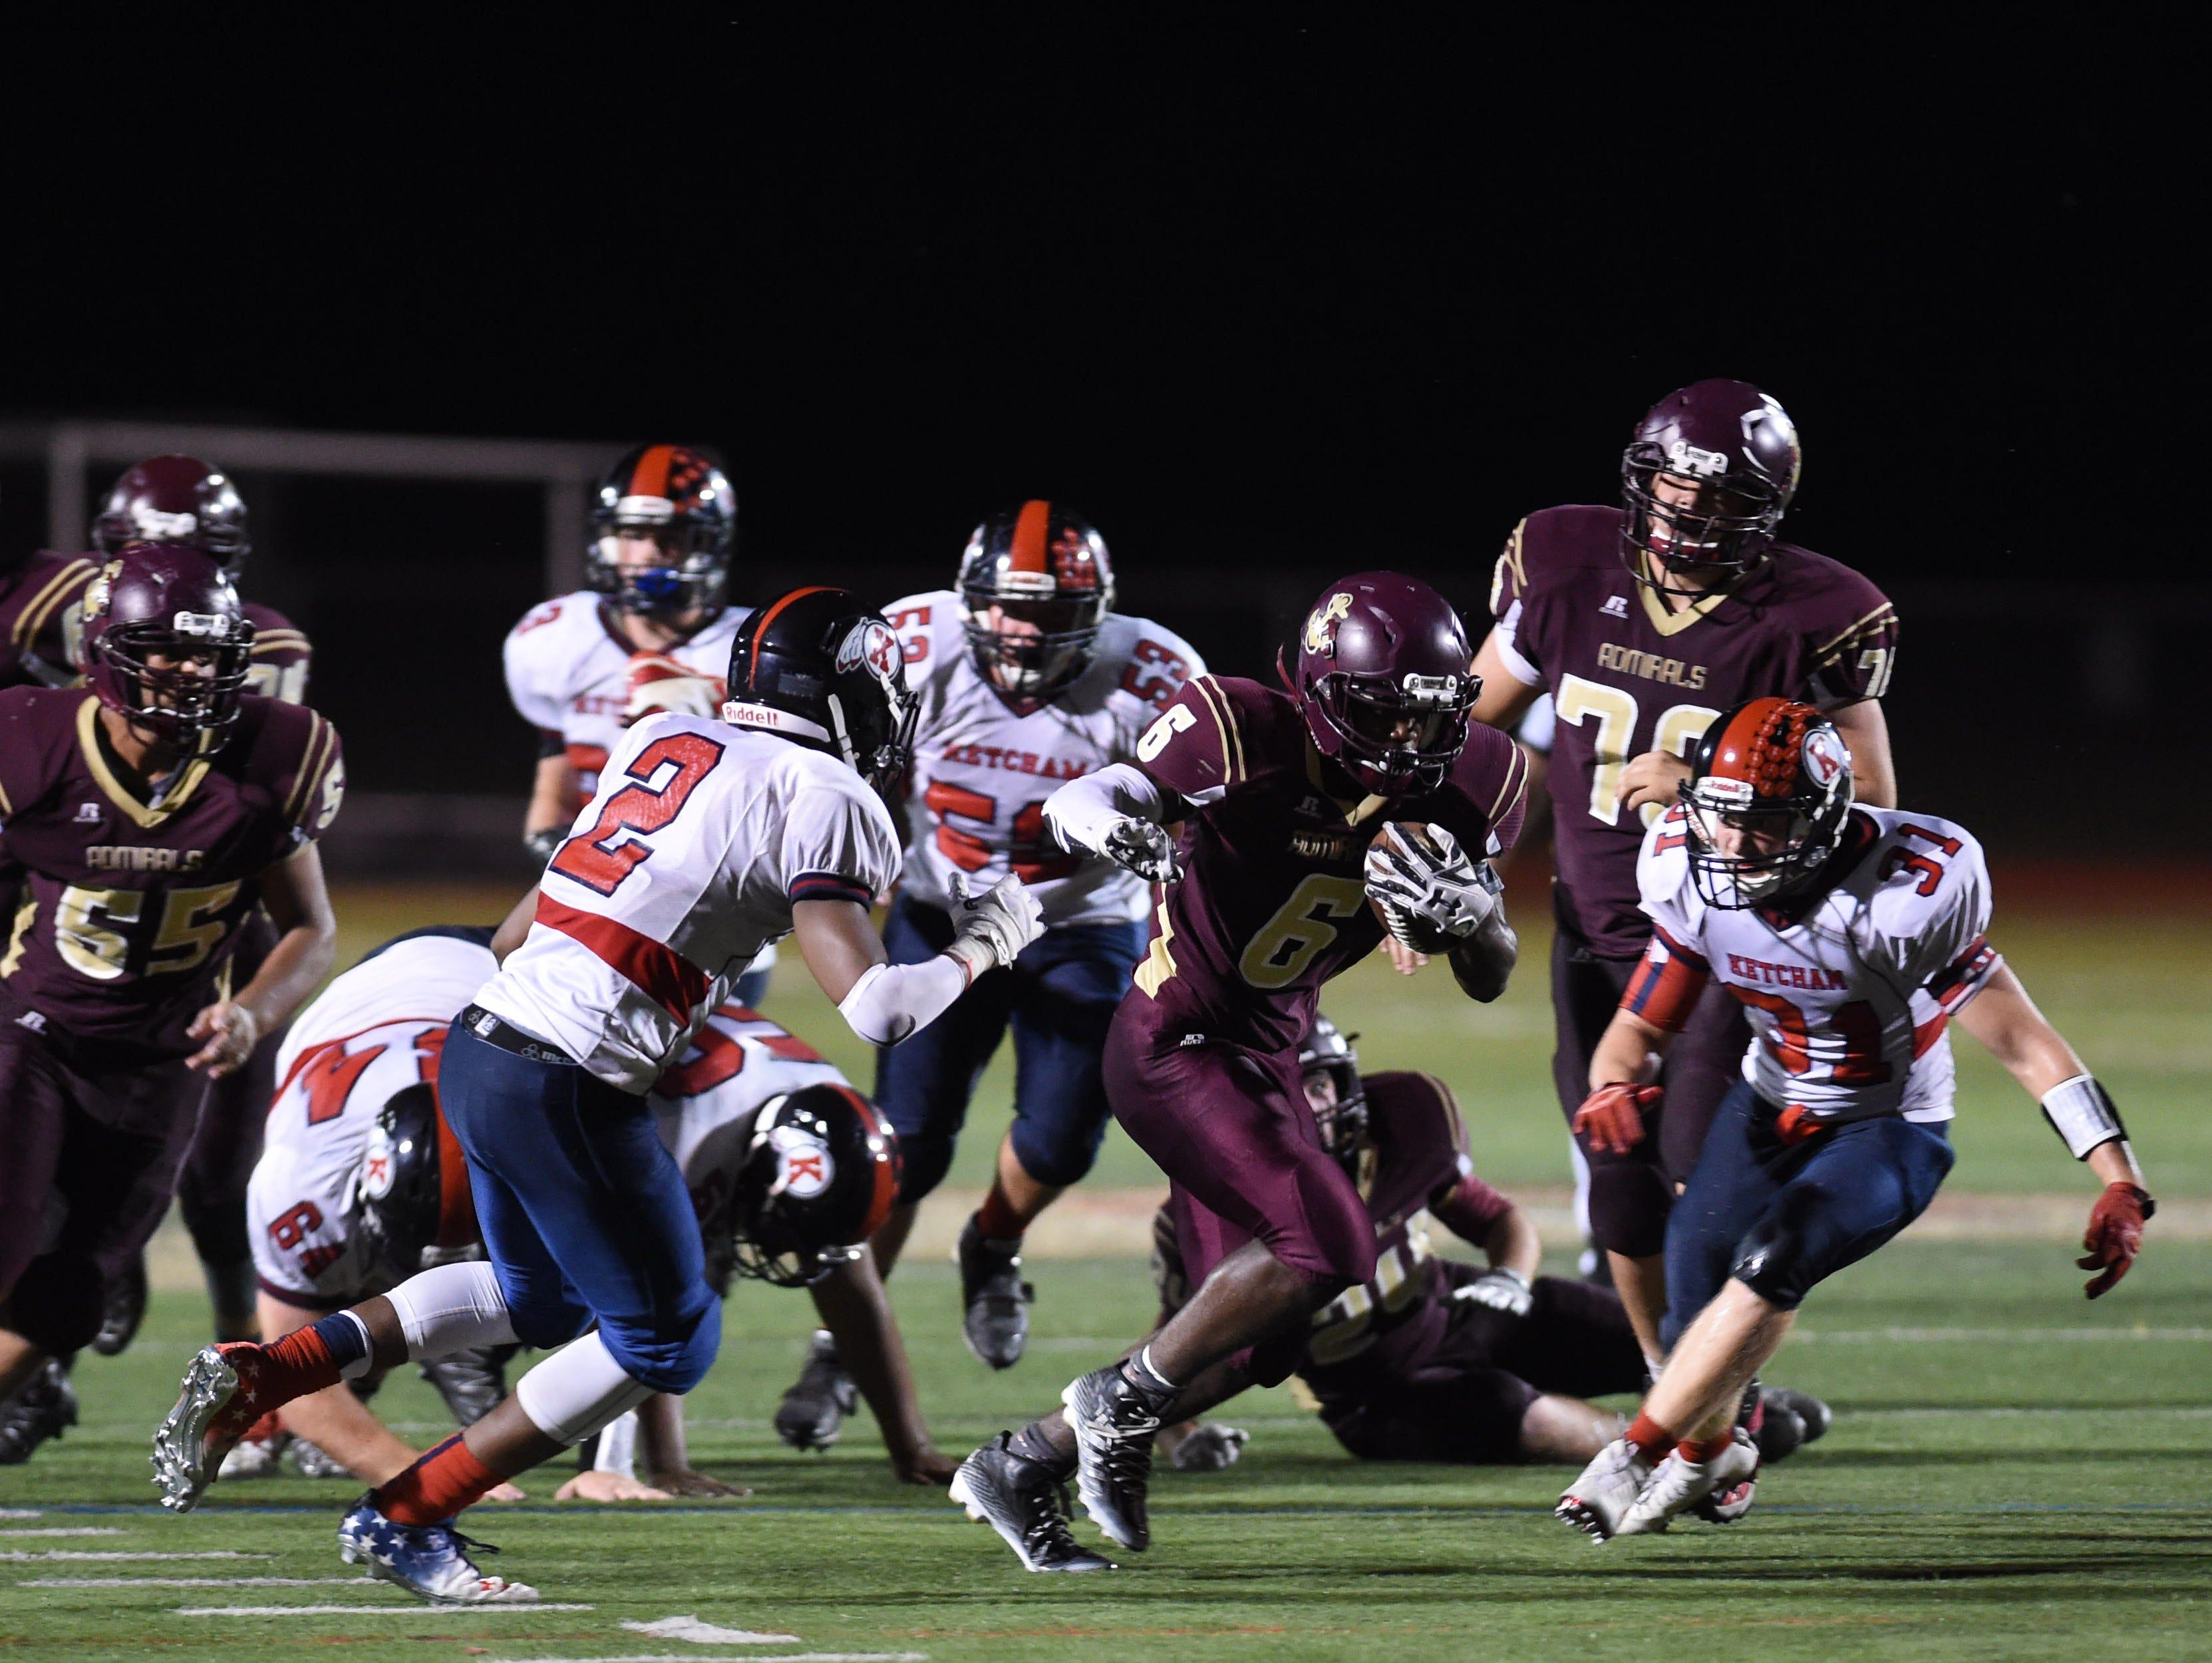 Arlington High School's Ricardo Yolas breaks through Roy C. Ketcham defenders on Friday in Freedom Plains.